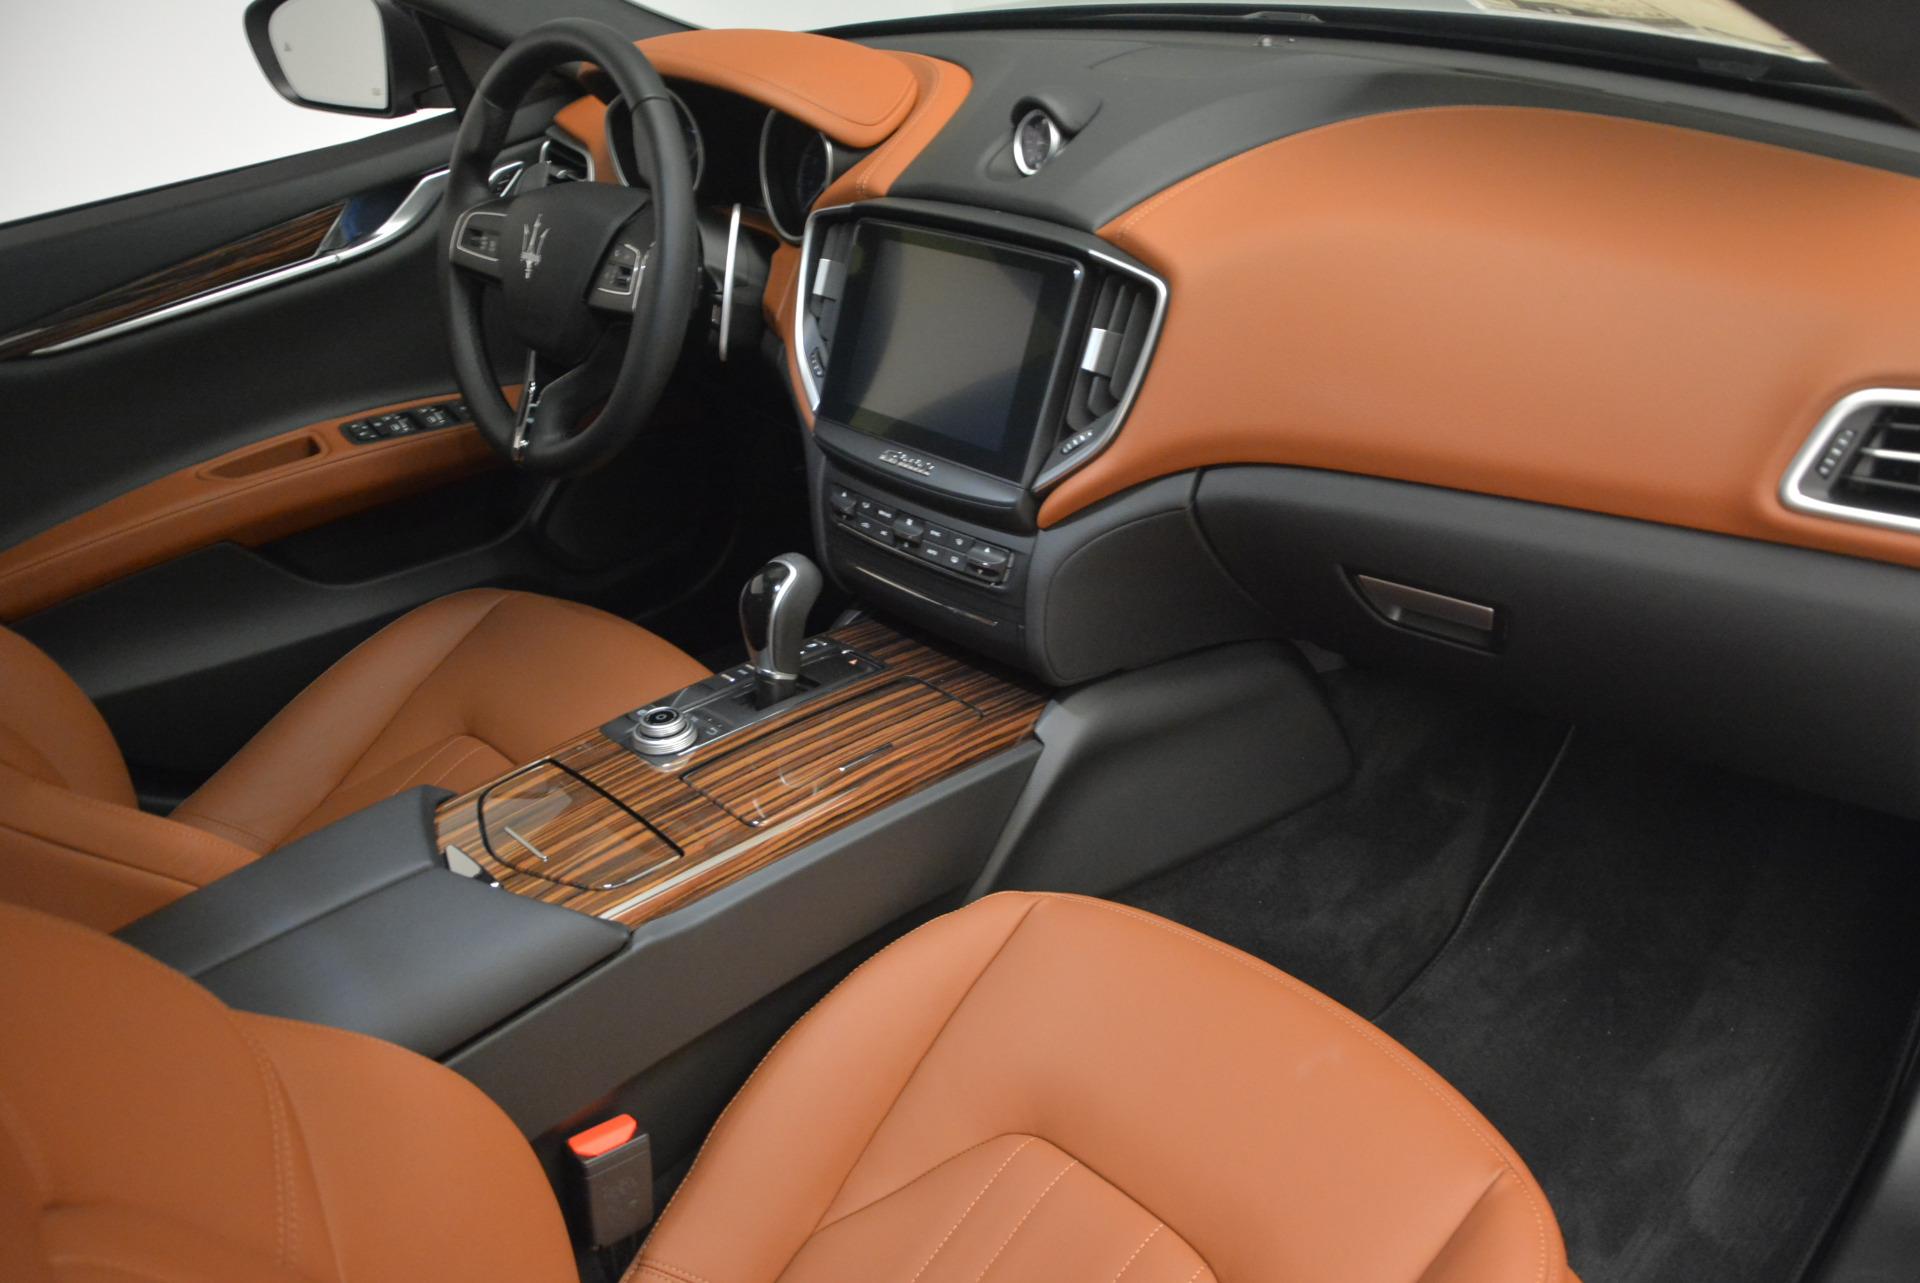 Used 2017 Maserati Ghibli S Q4 - EX Loaner For Sale In Greenwich, CT 567_p19